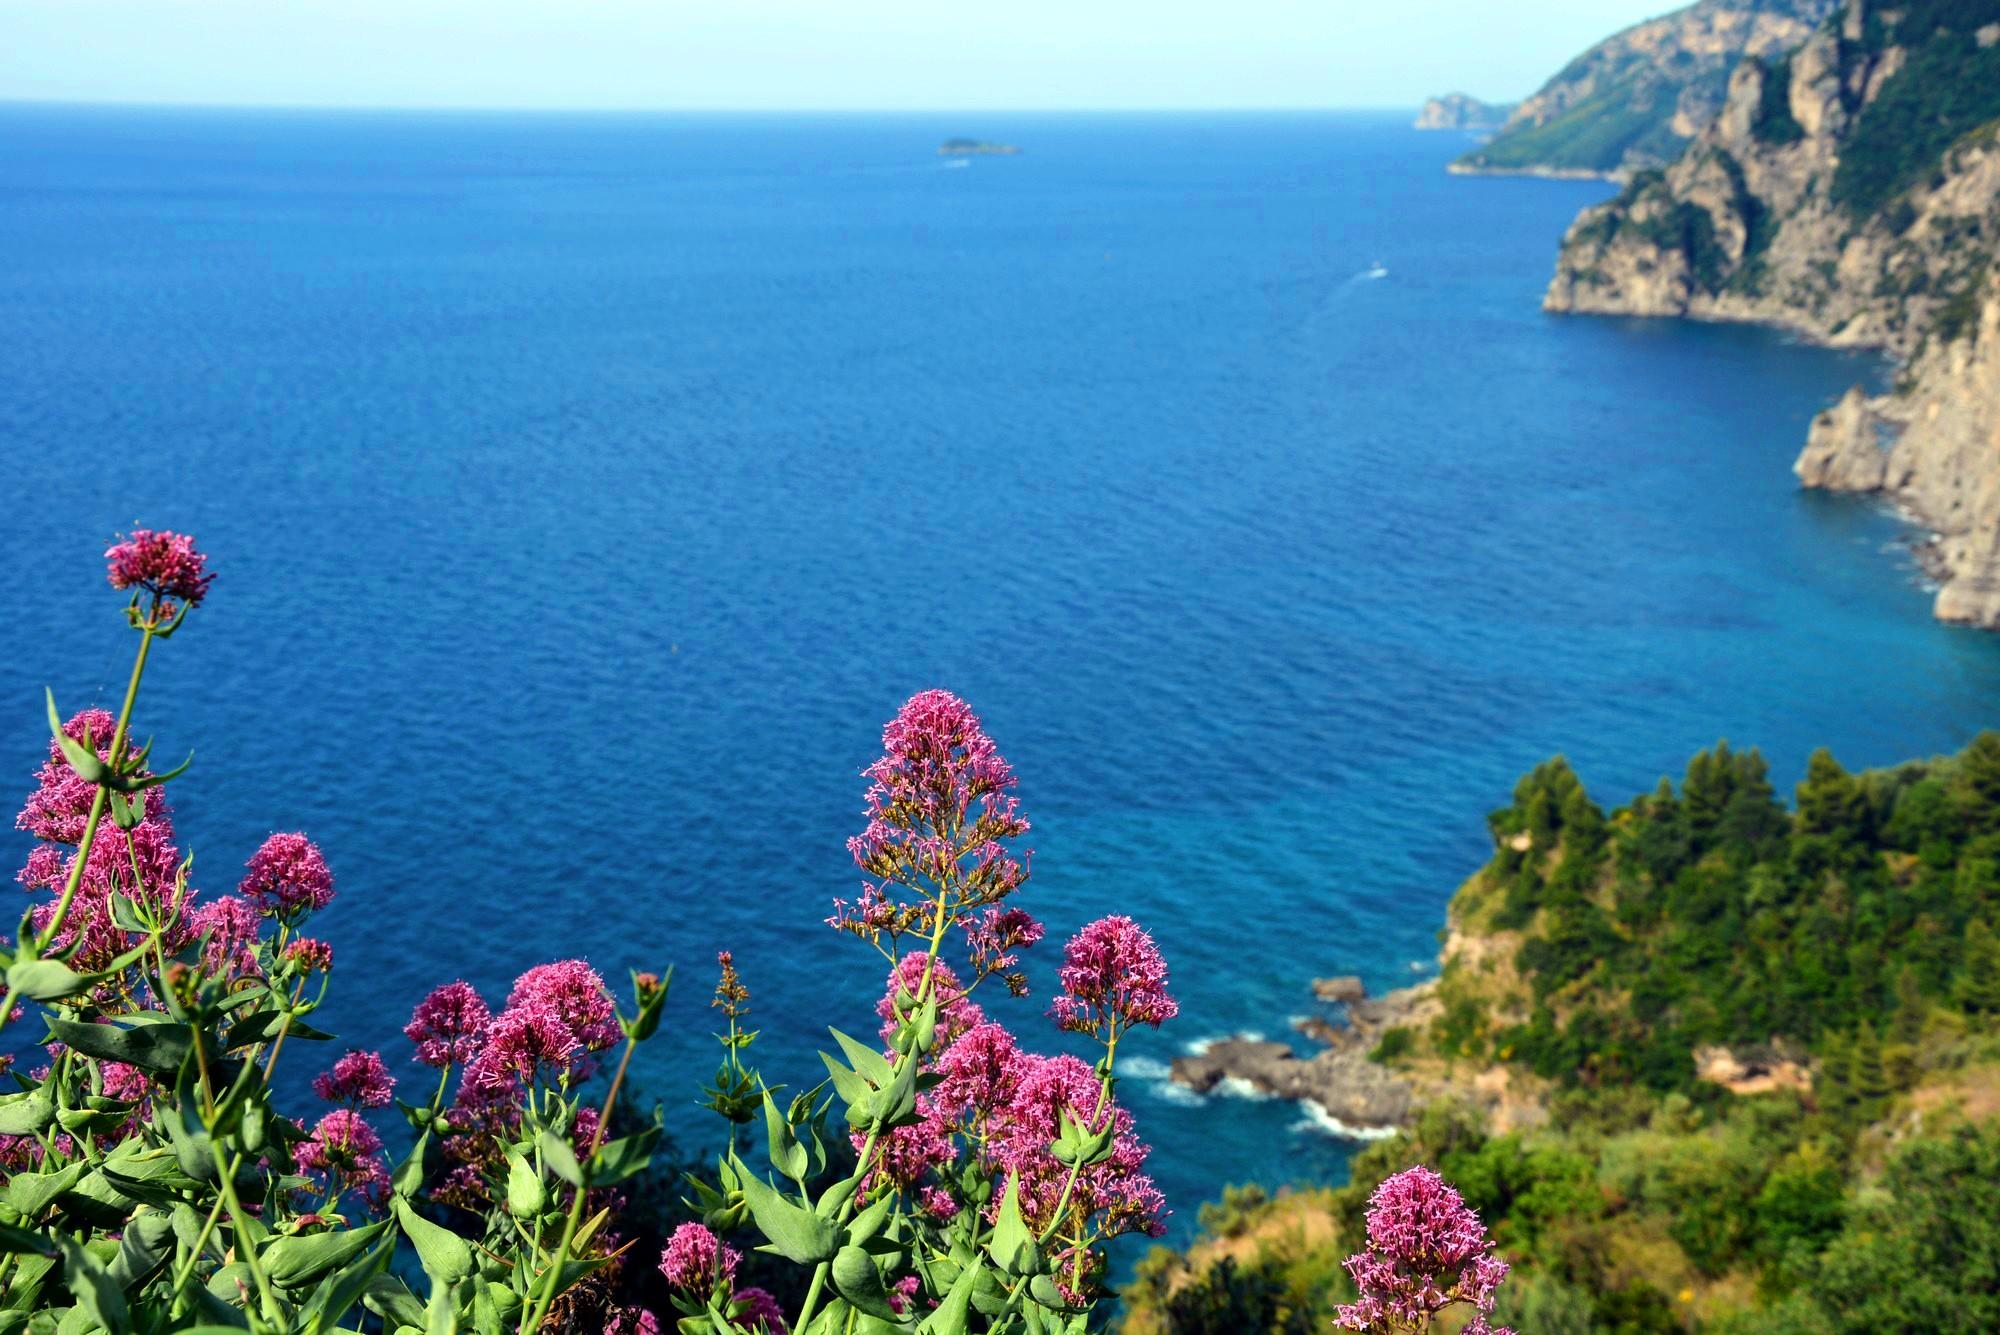 the Sorrento coast